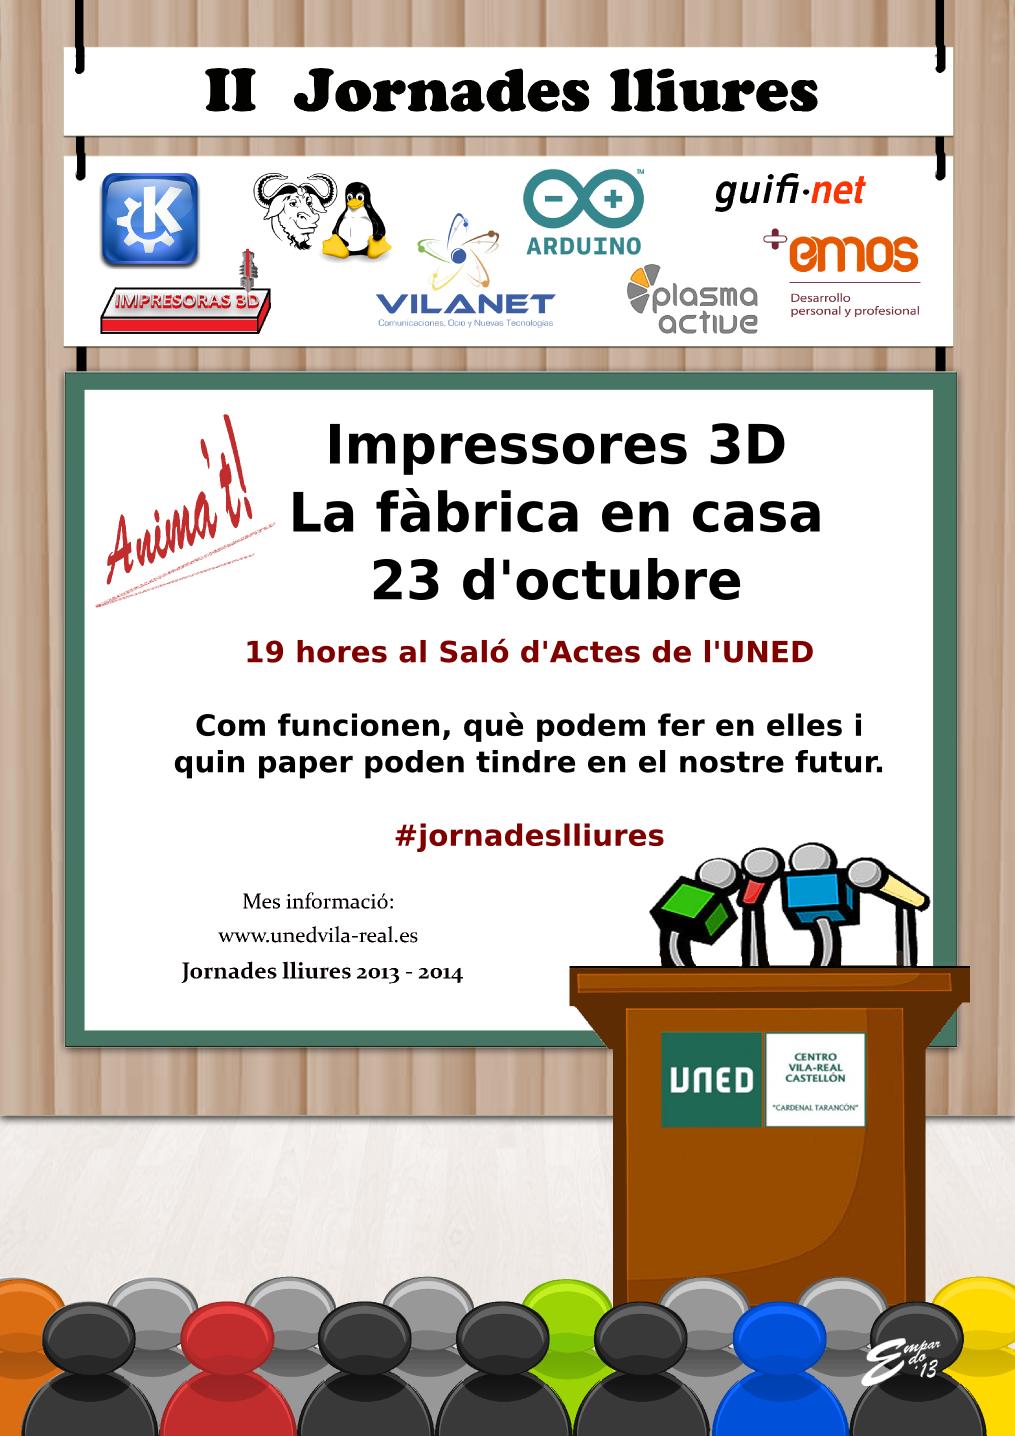 II Jornadas Libres: 23 de octubre, Impresoras 3D